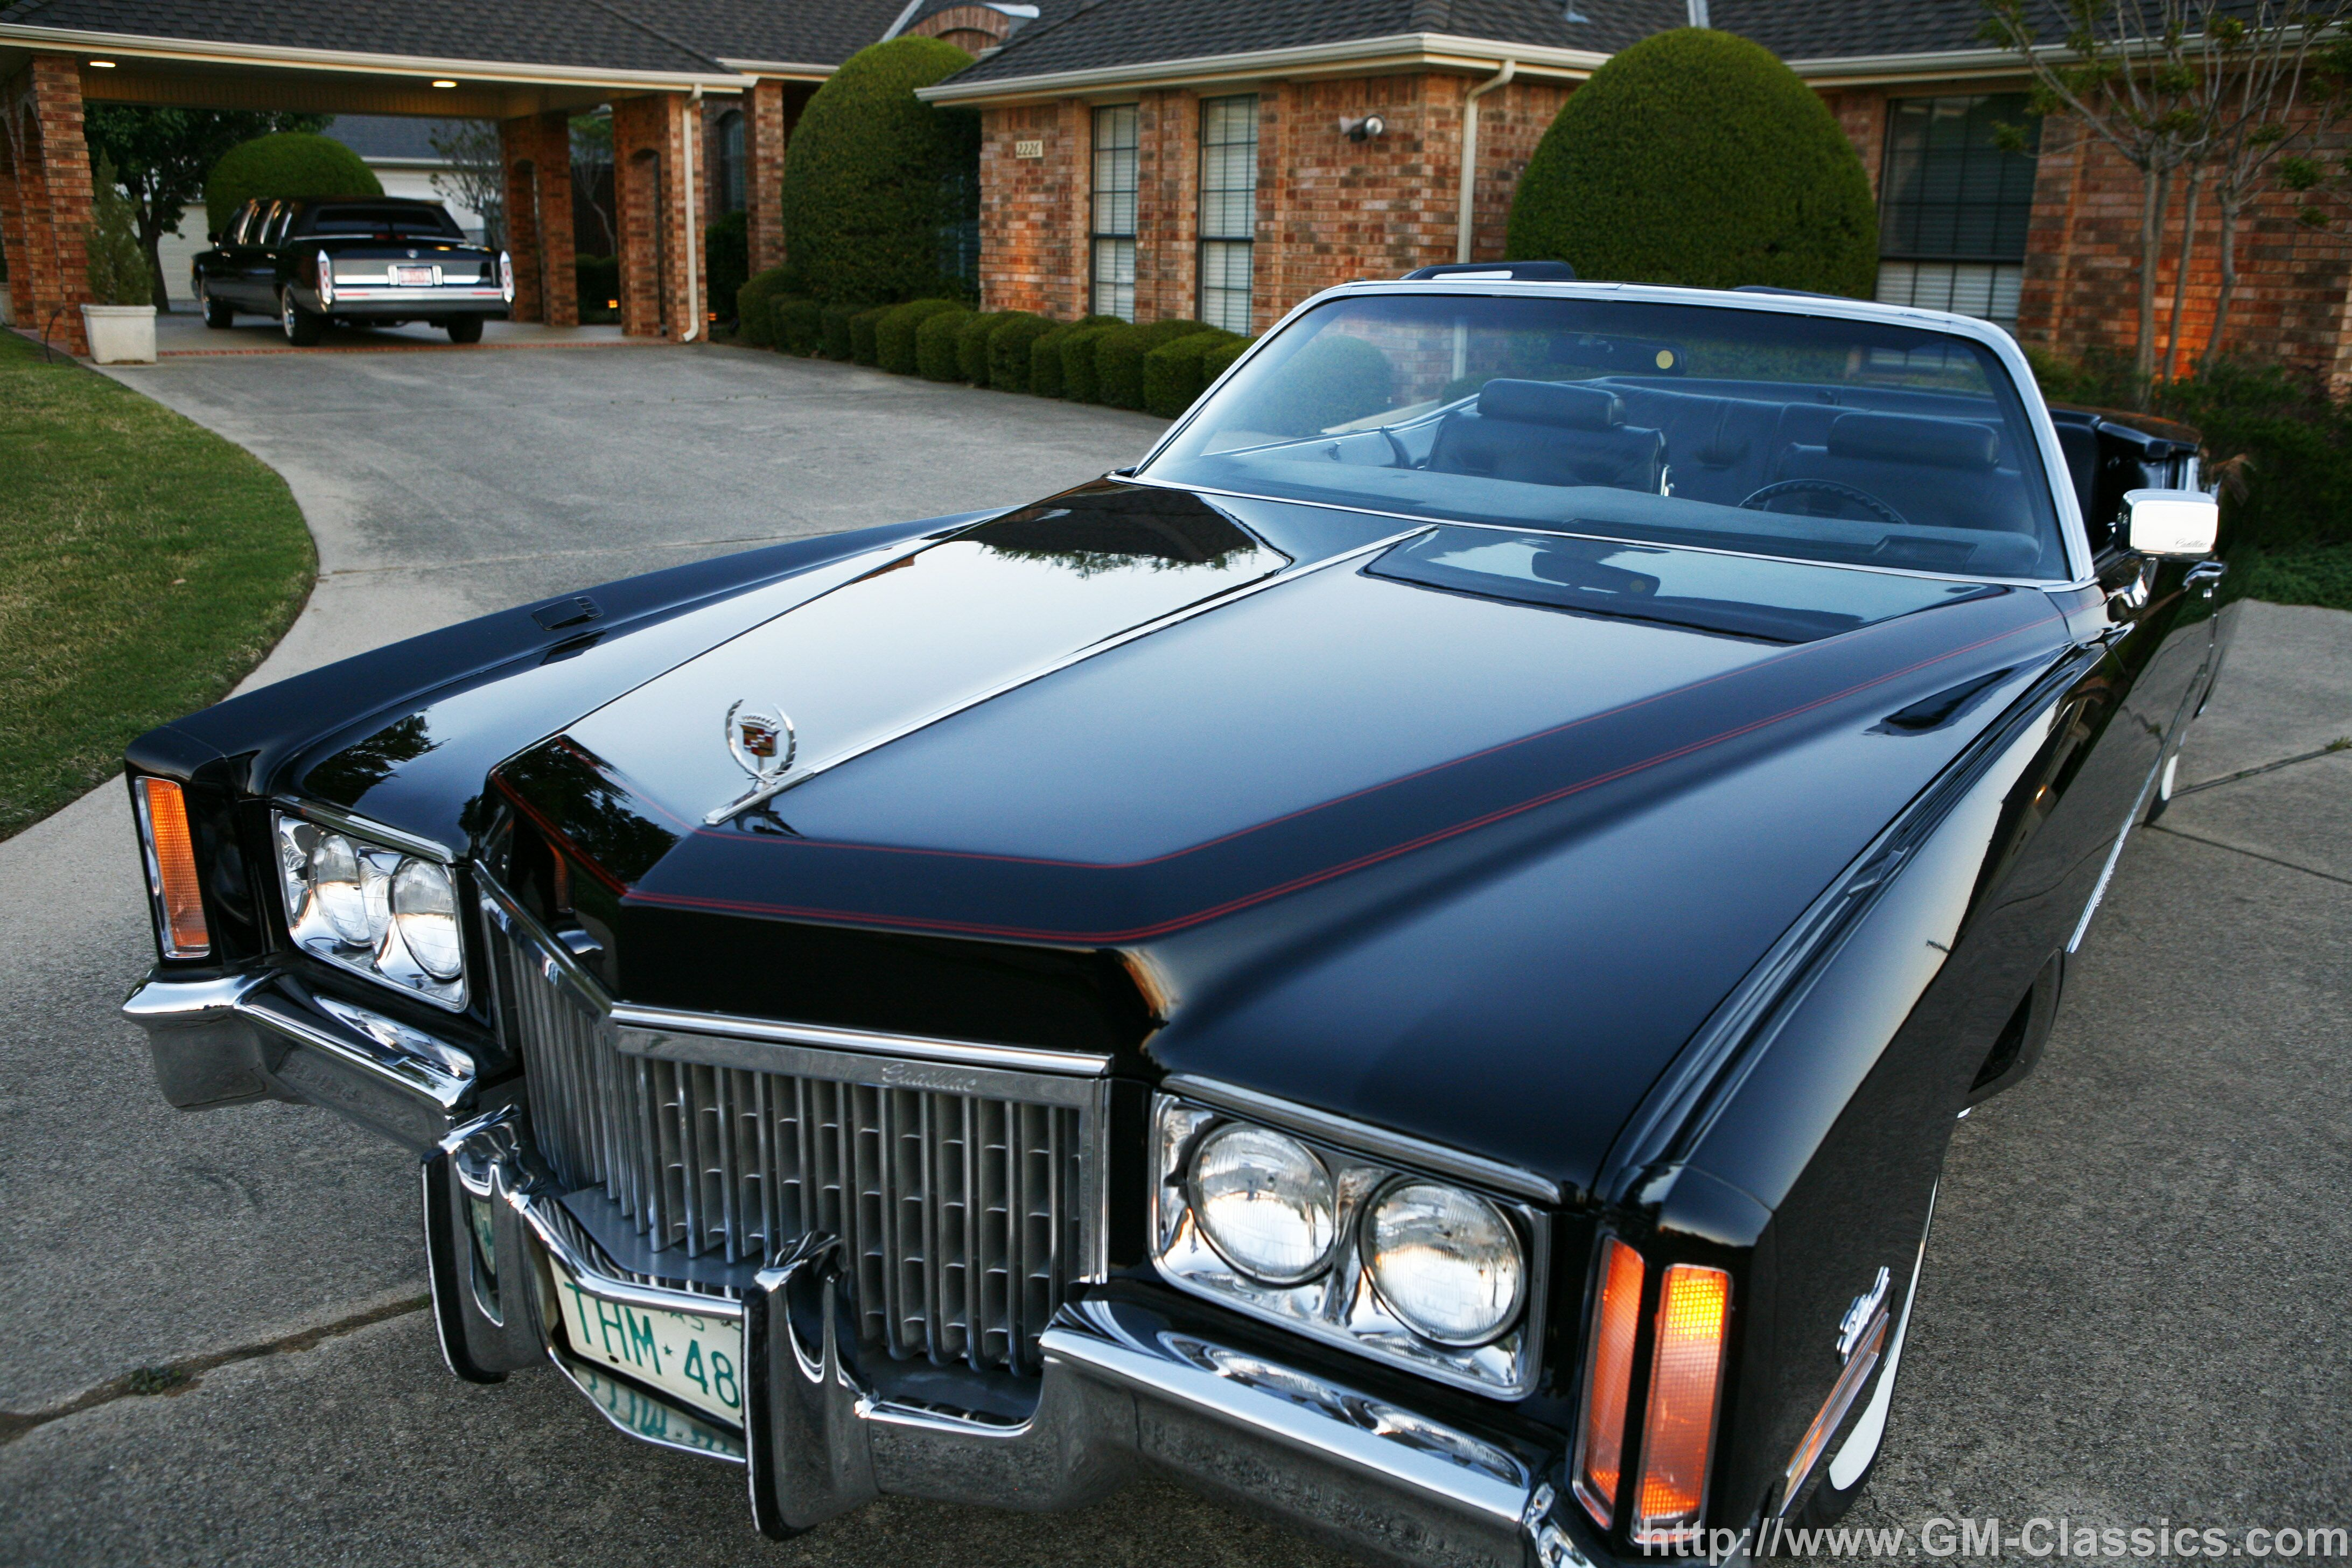 1972 Cadillac Eldorado Convertible - Matt Garrett